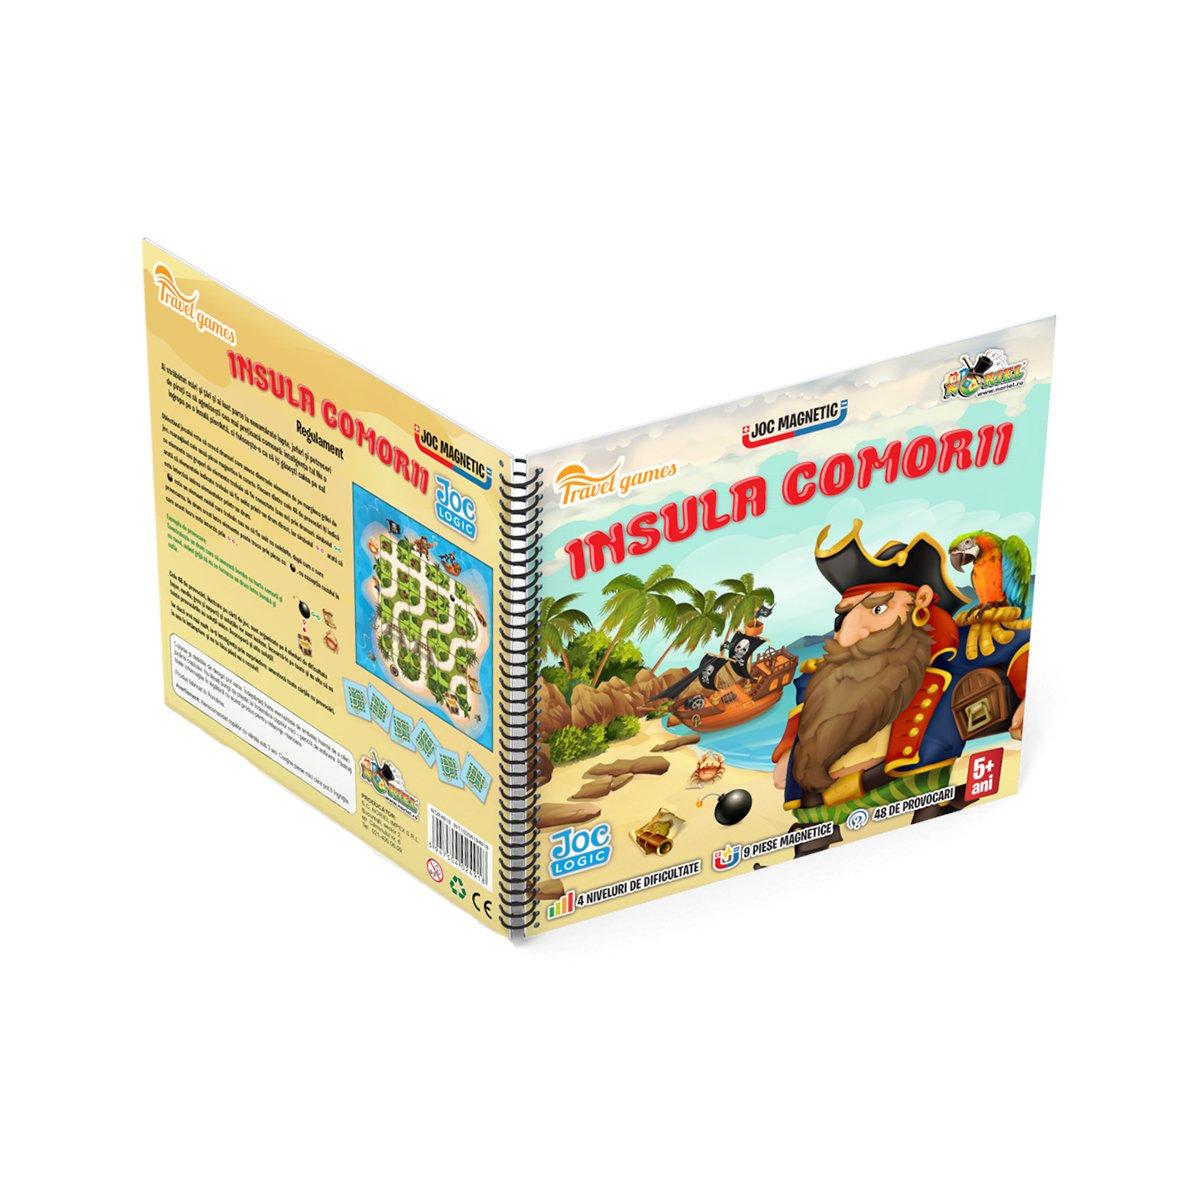 Joc magnetic interactiv Noriel Games. Insula comorii